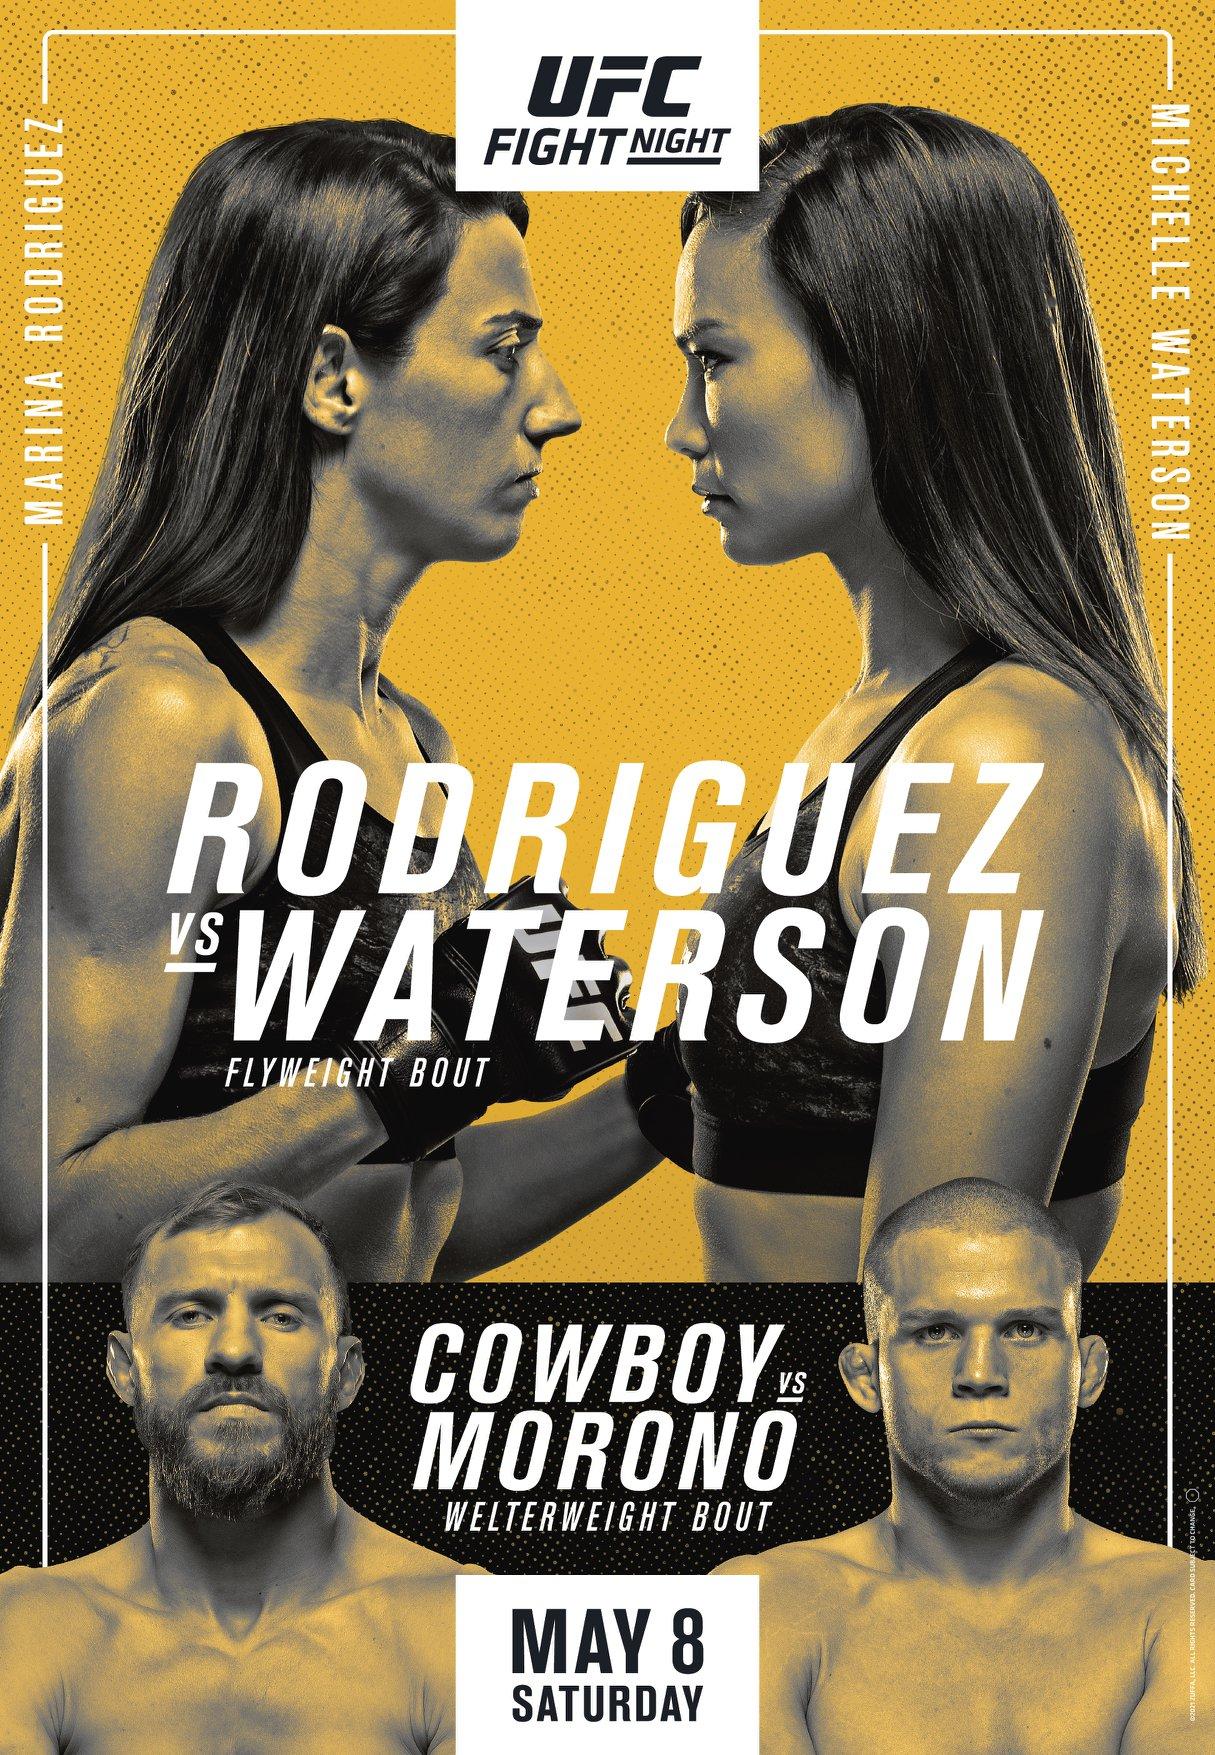 Rodriguez vs Waterson